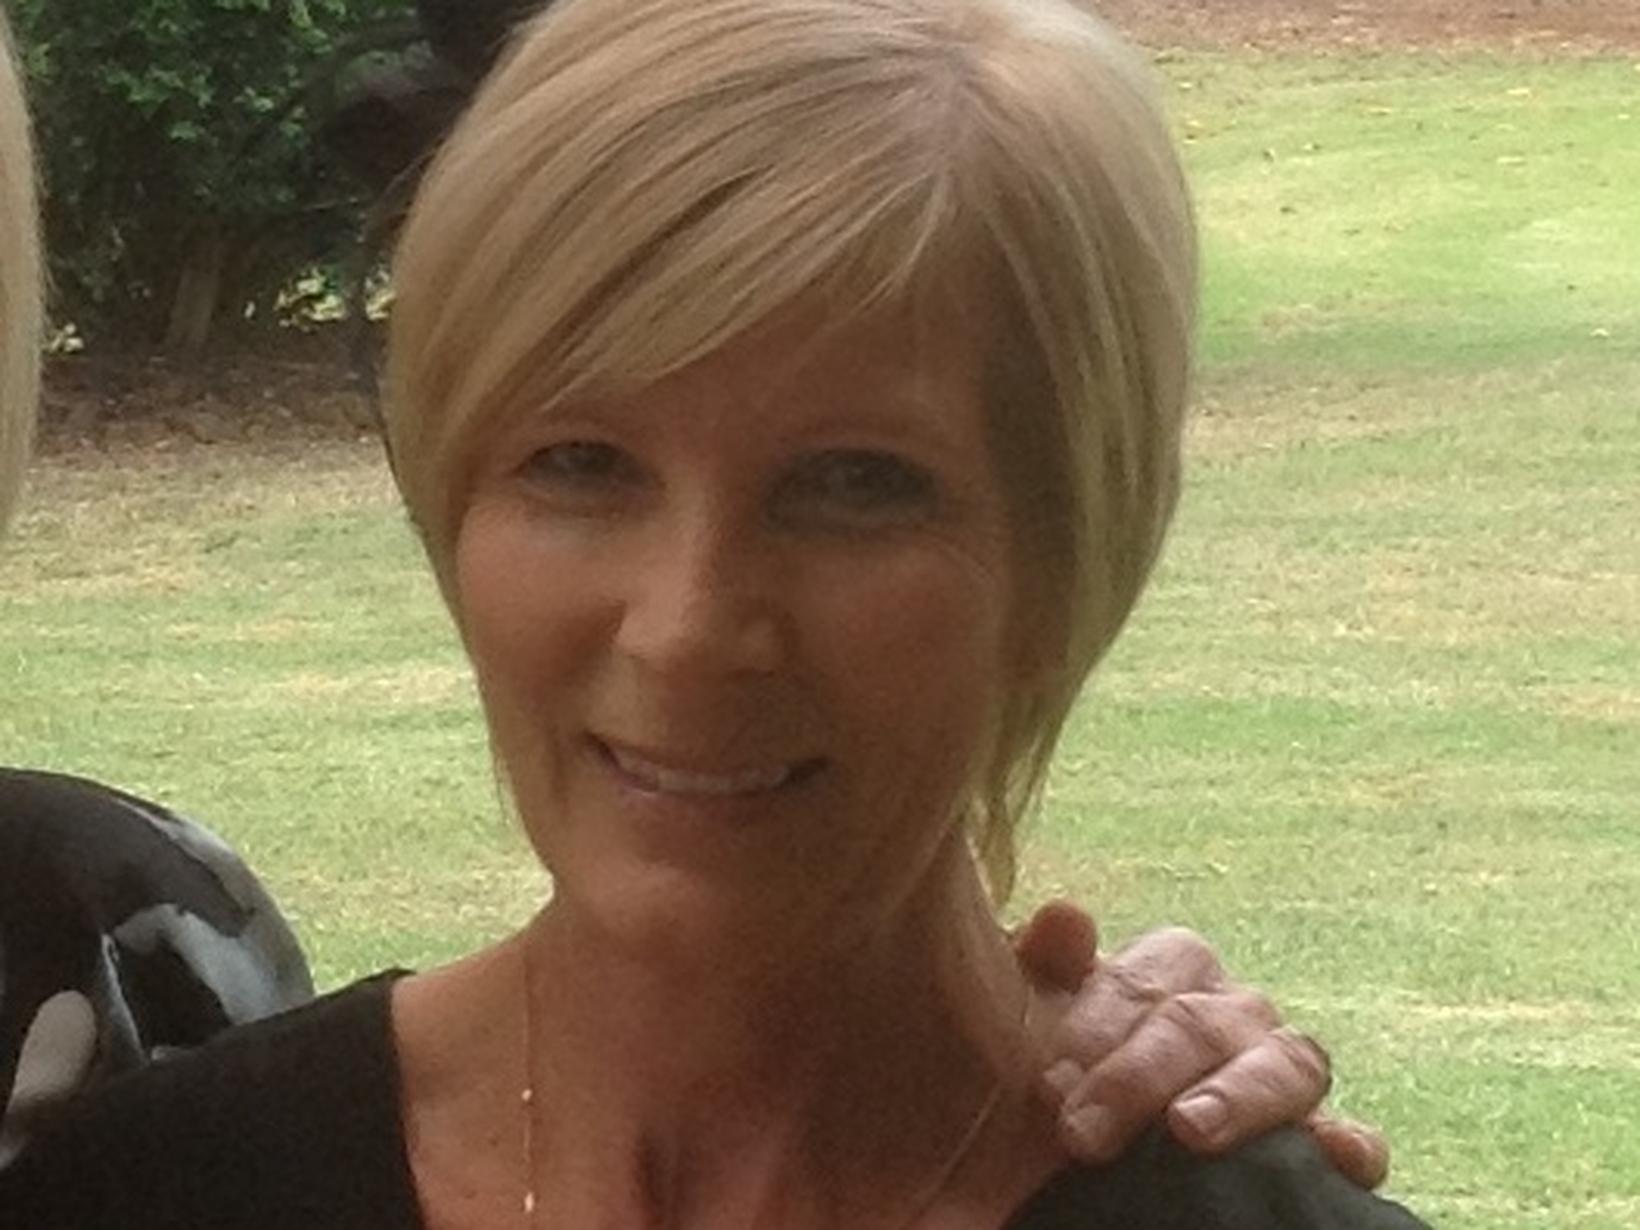 Elizabeth from Tweed Heads, New South Wales, Australia